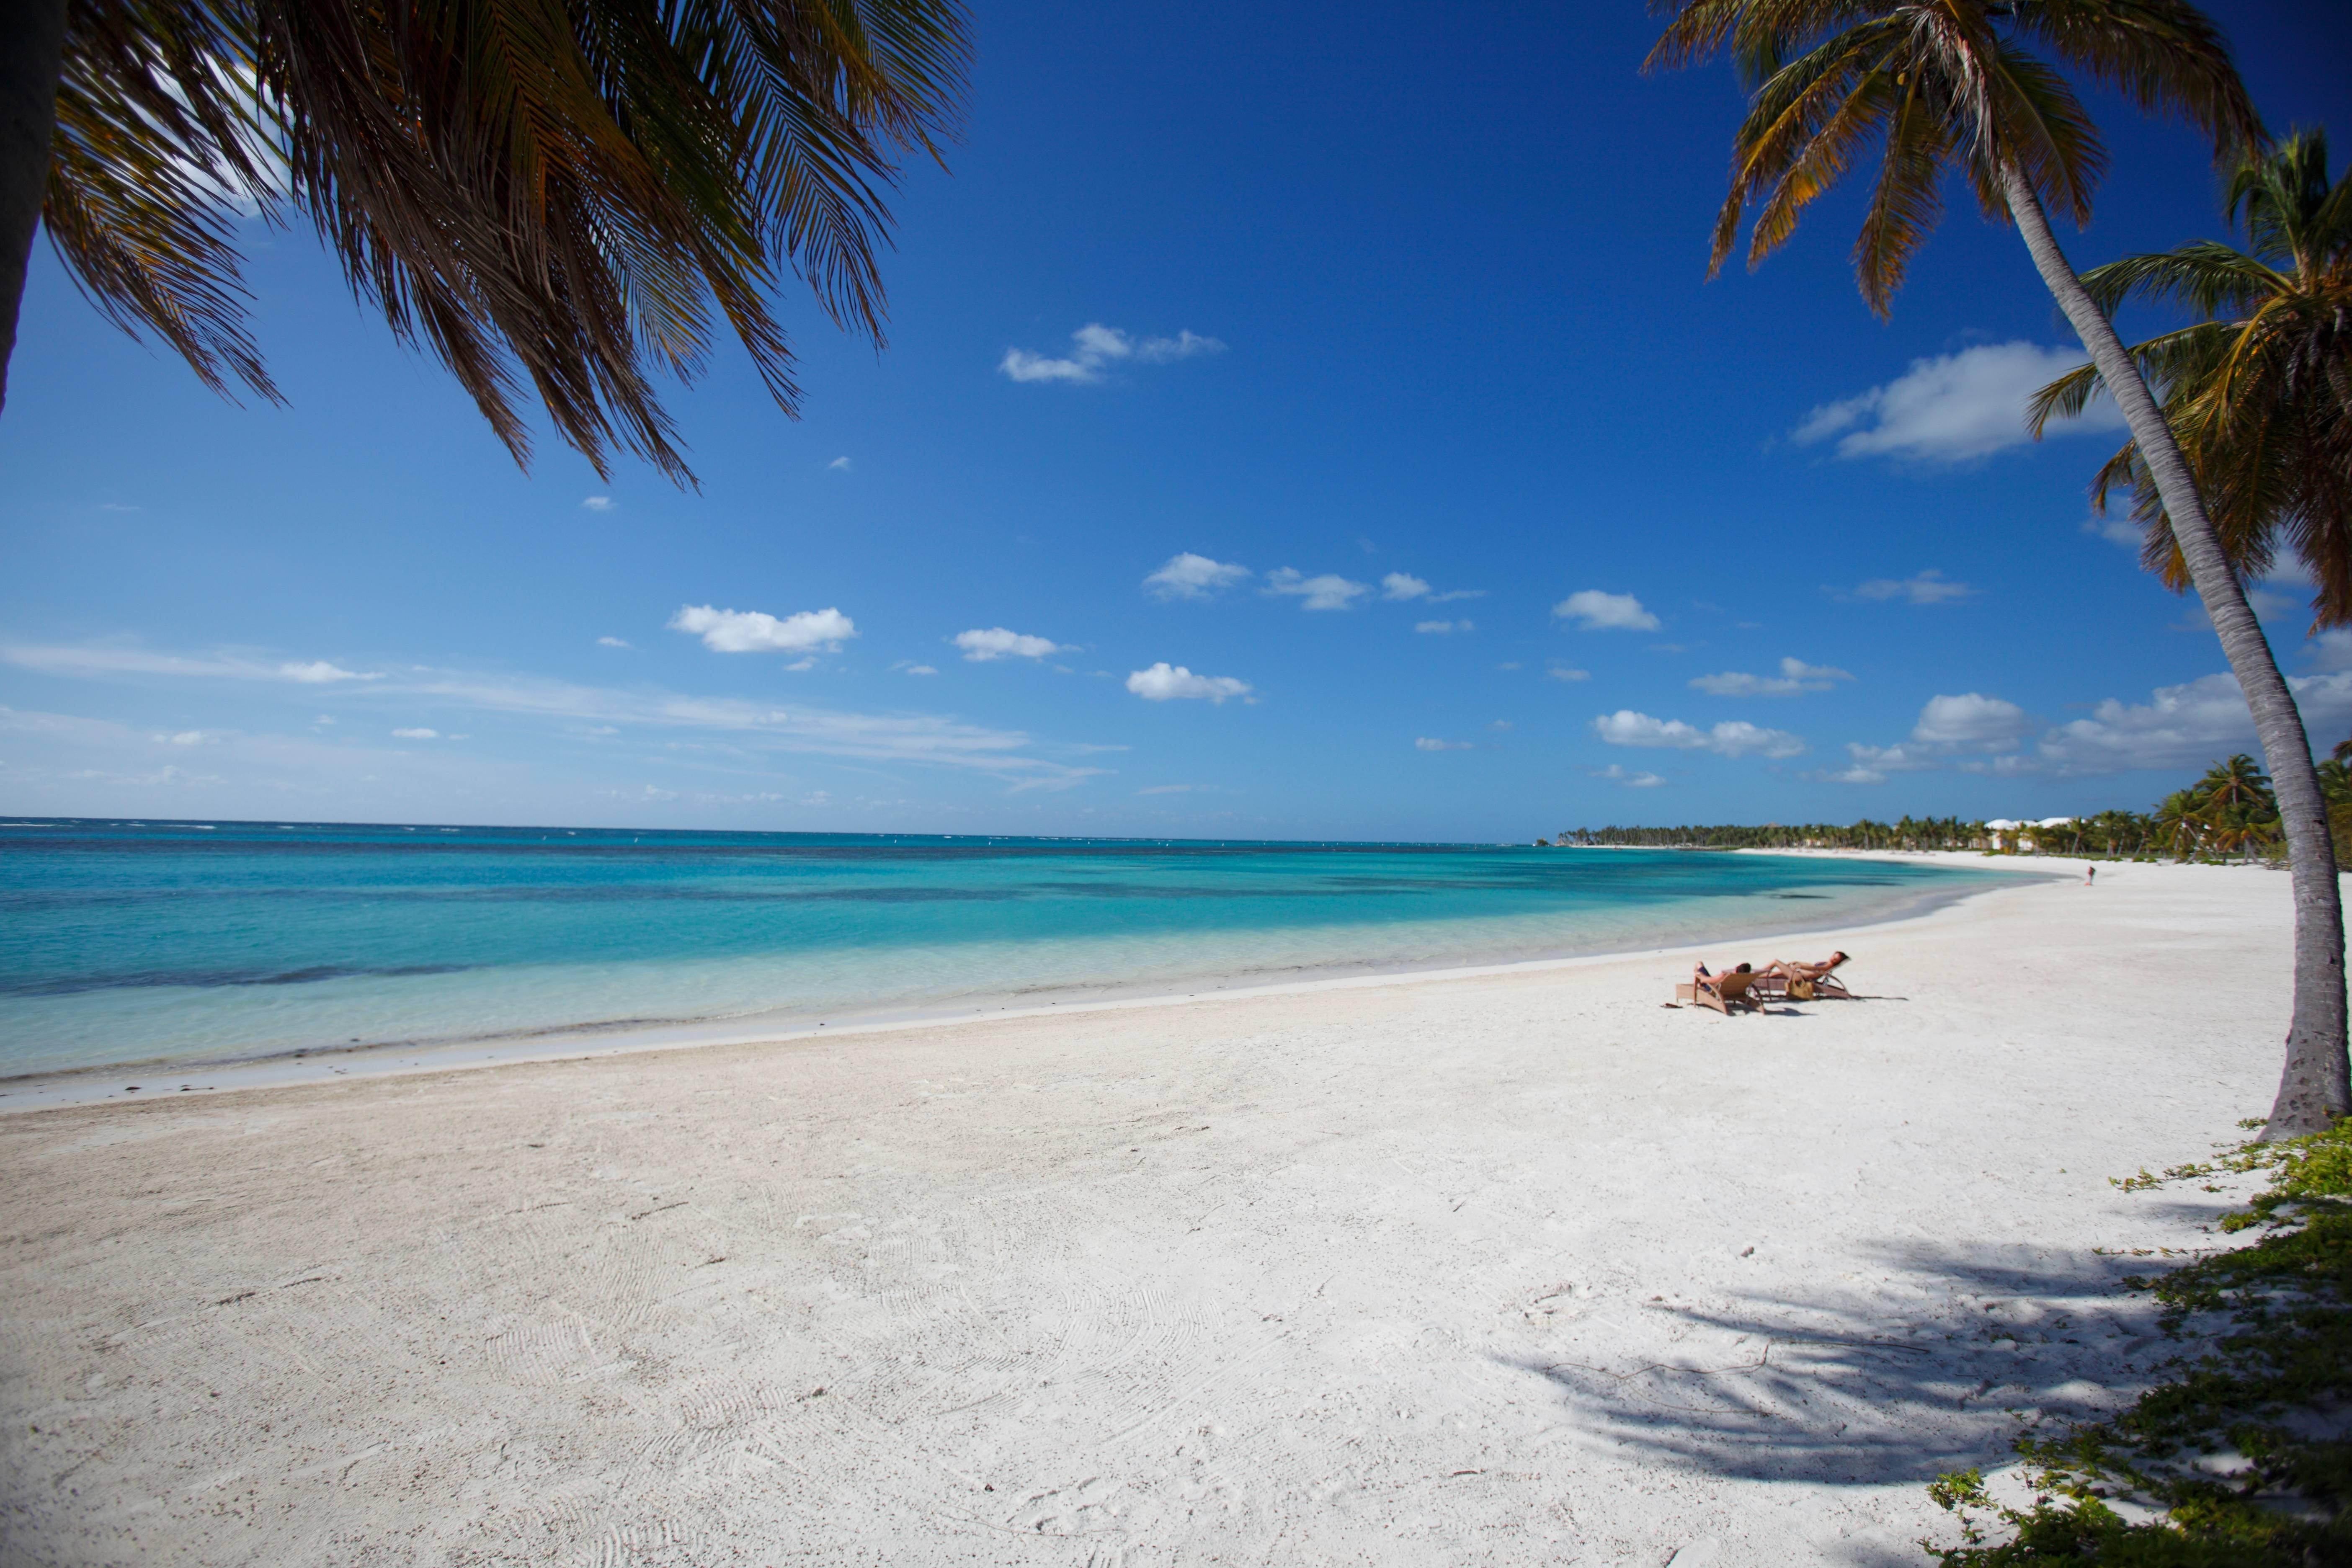 Wallpapers Backgrounds   Bavaro Beach Punta Cana Dominican Republic 5616x3744